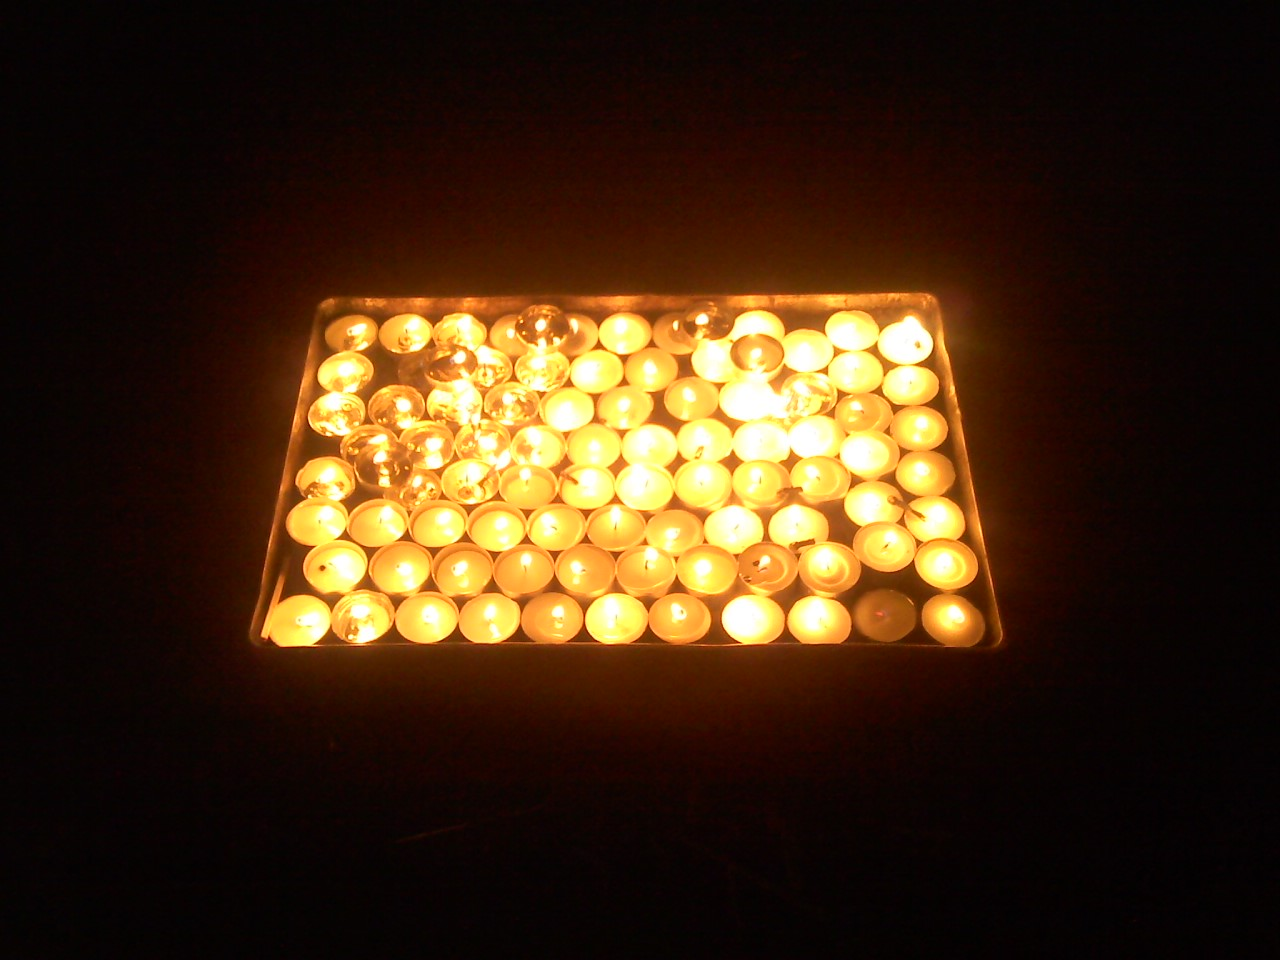 www.tarotbyjacqueline.com_banishing_negativity burn_candles